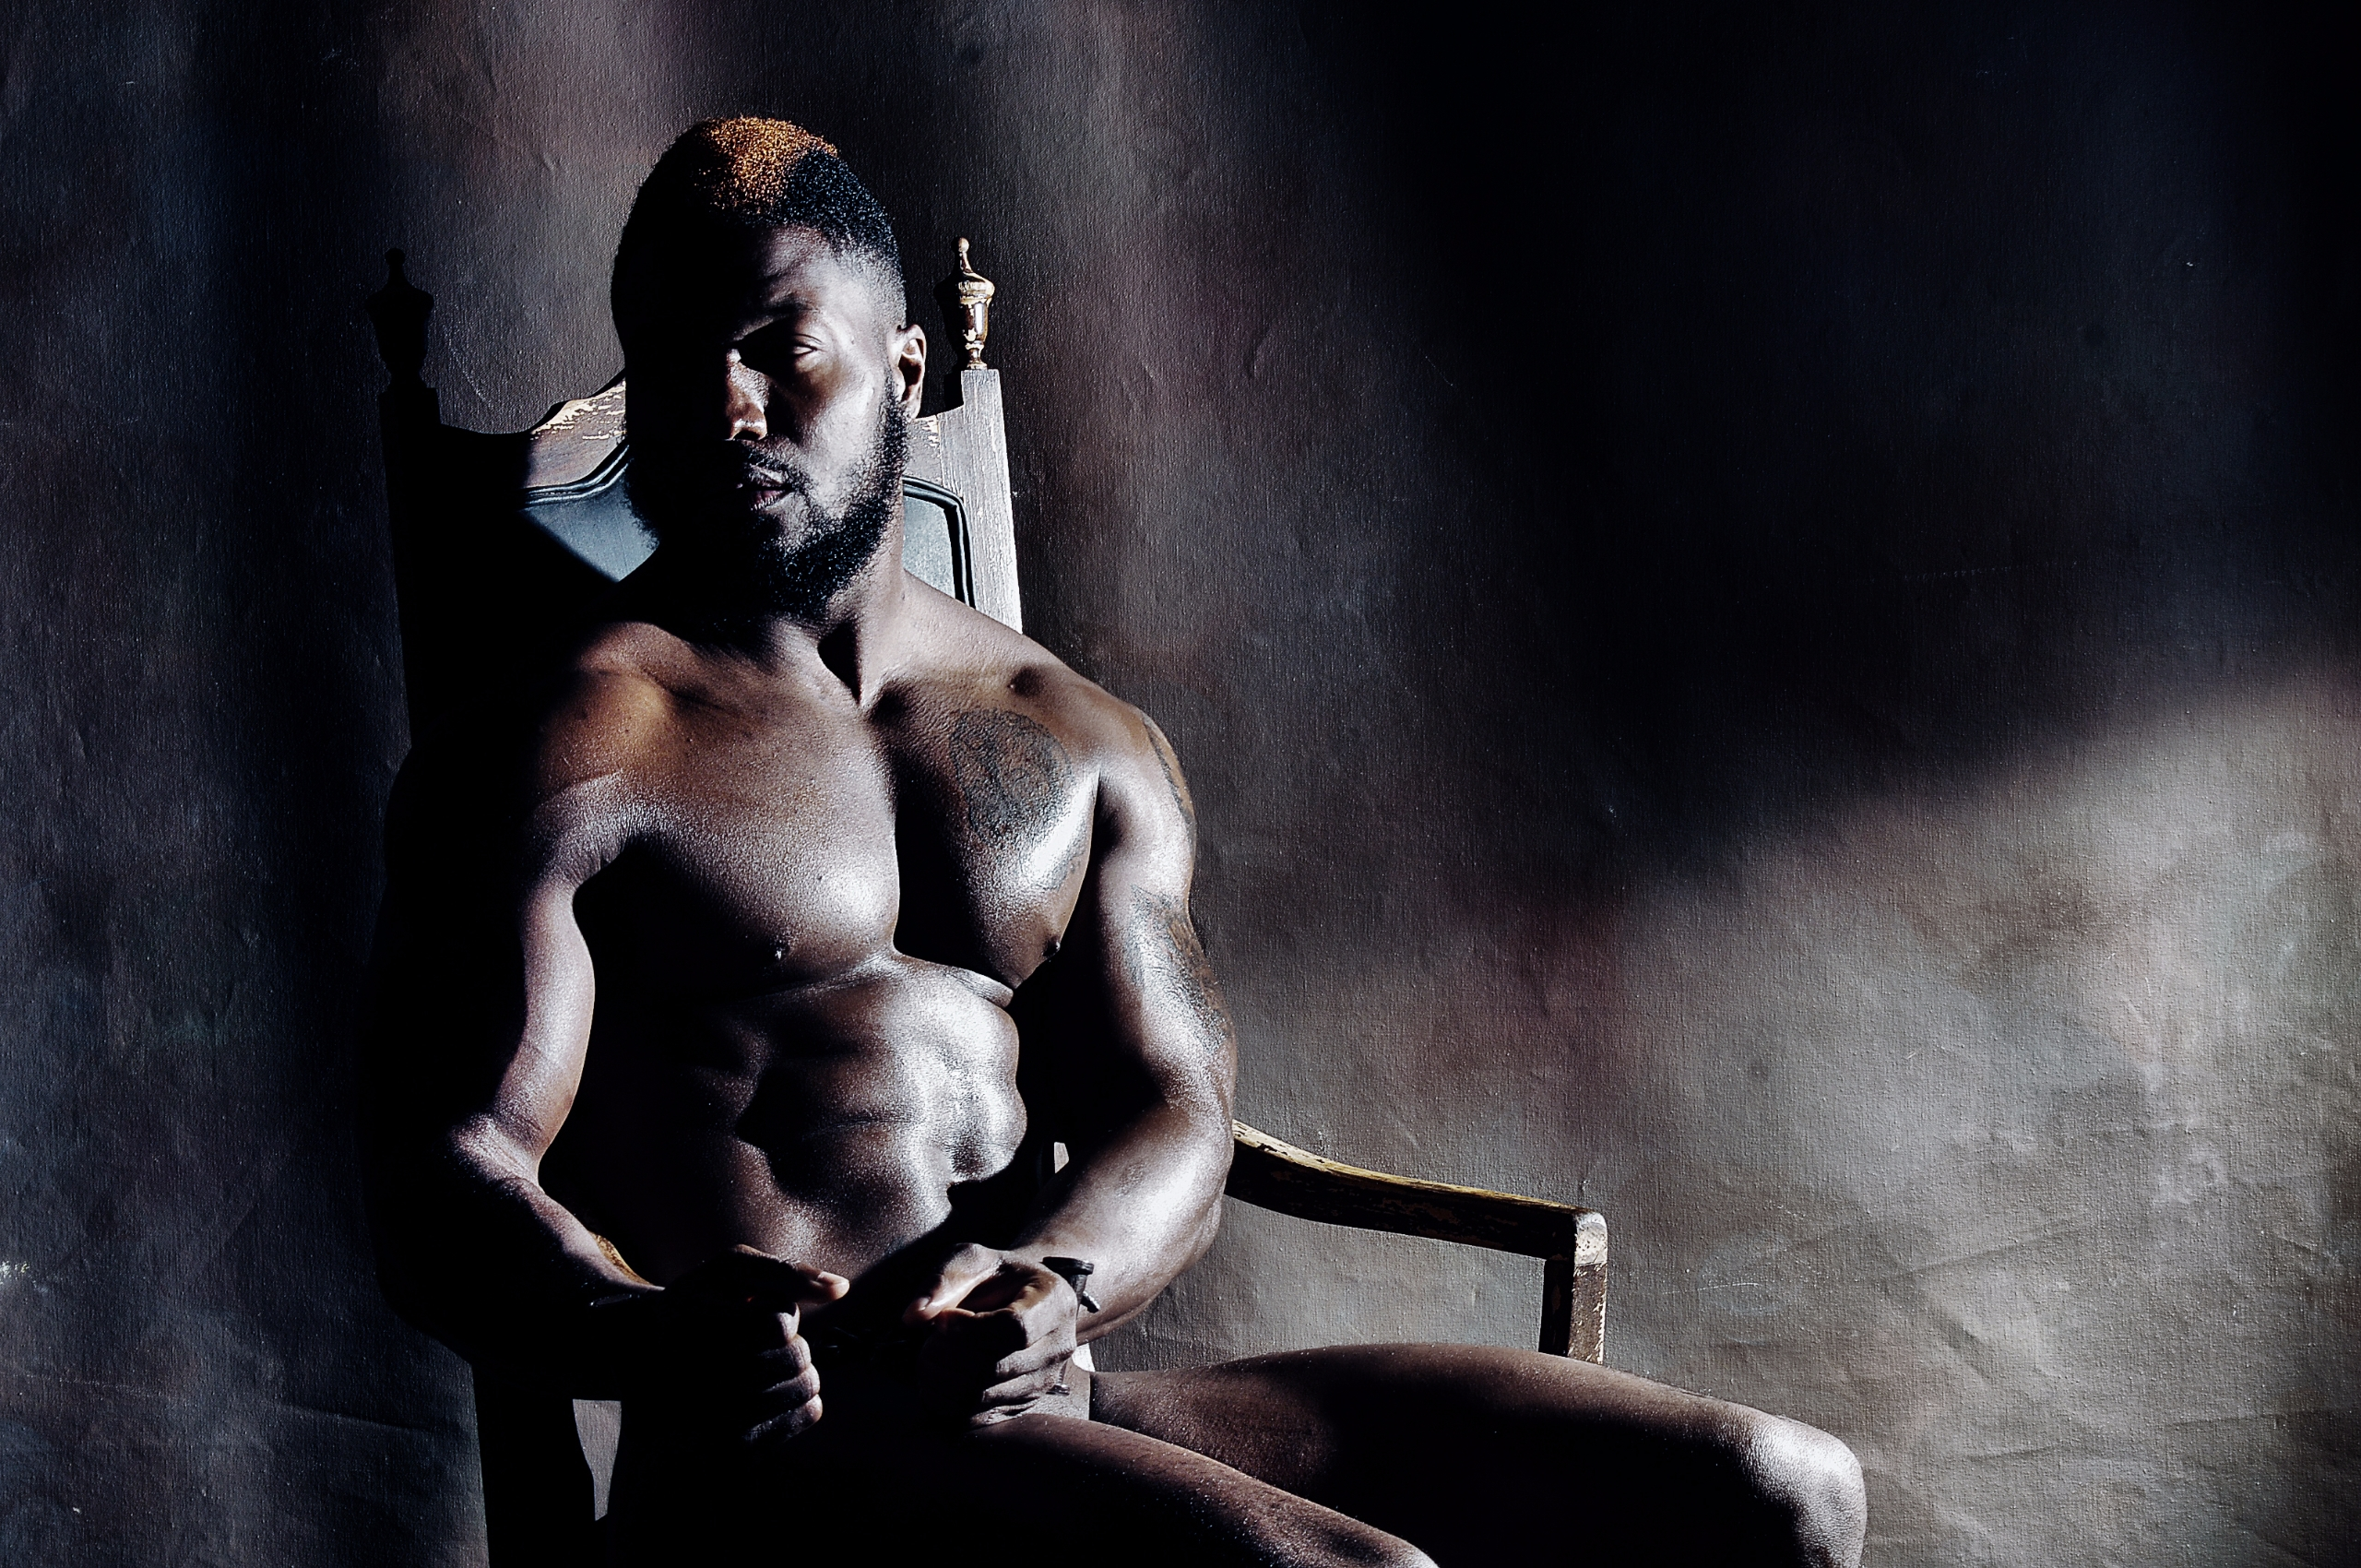 Slave ( Resist) Damali Conceptu - damaliism | ello